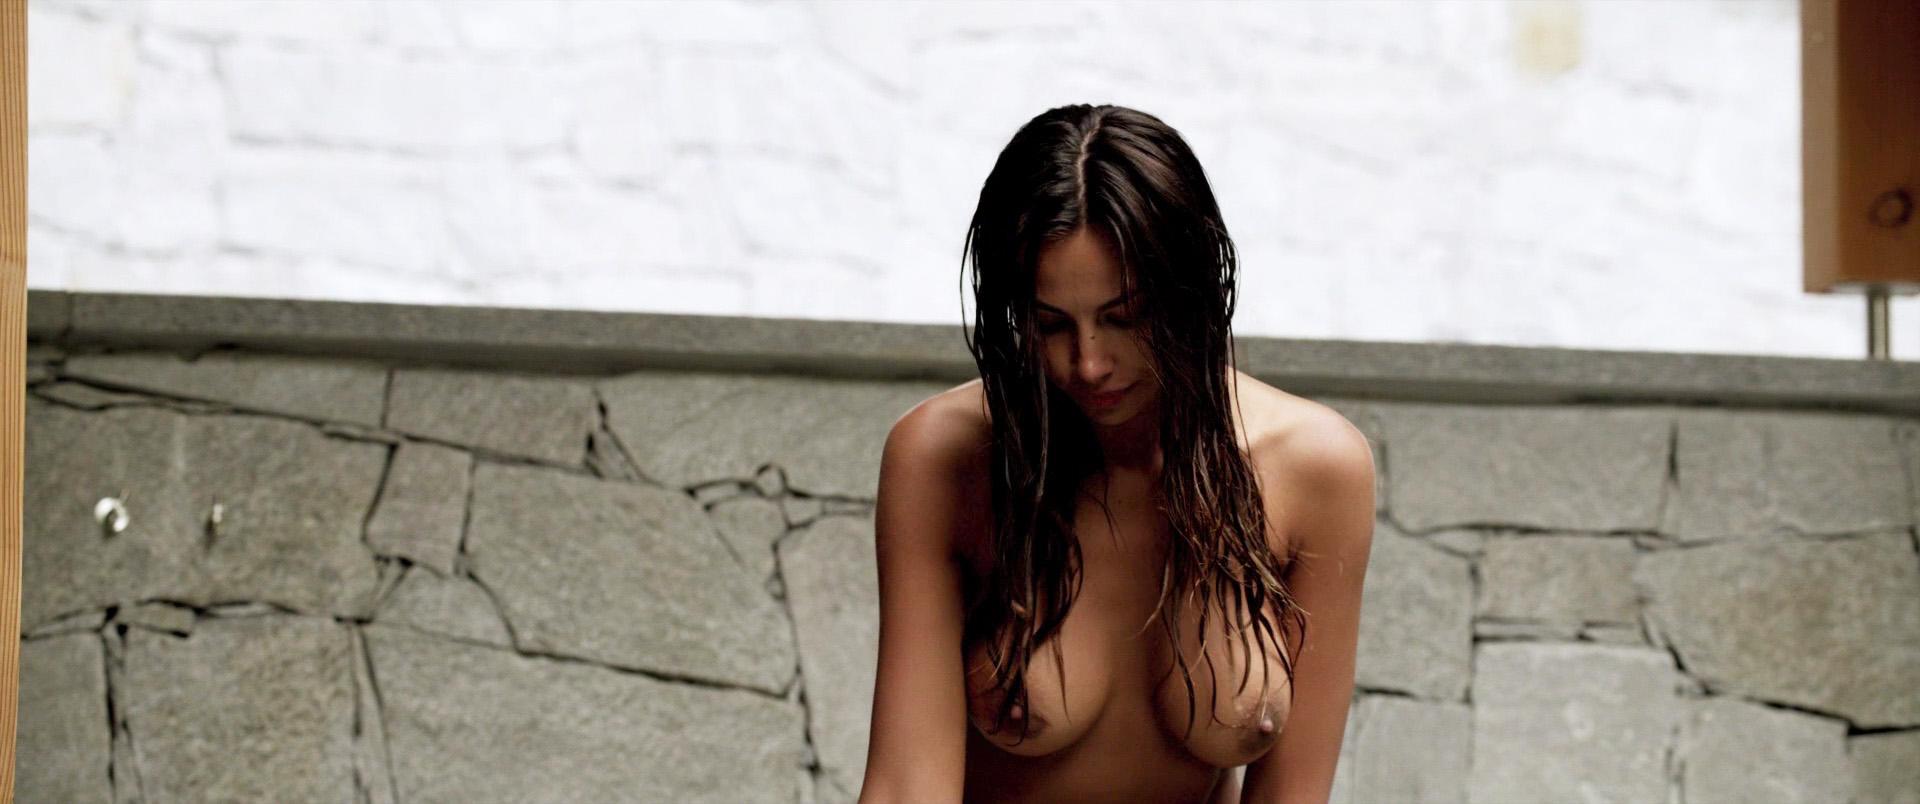 Madalina diana ghenea topless nude (64 image)